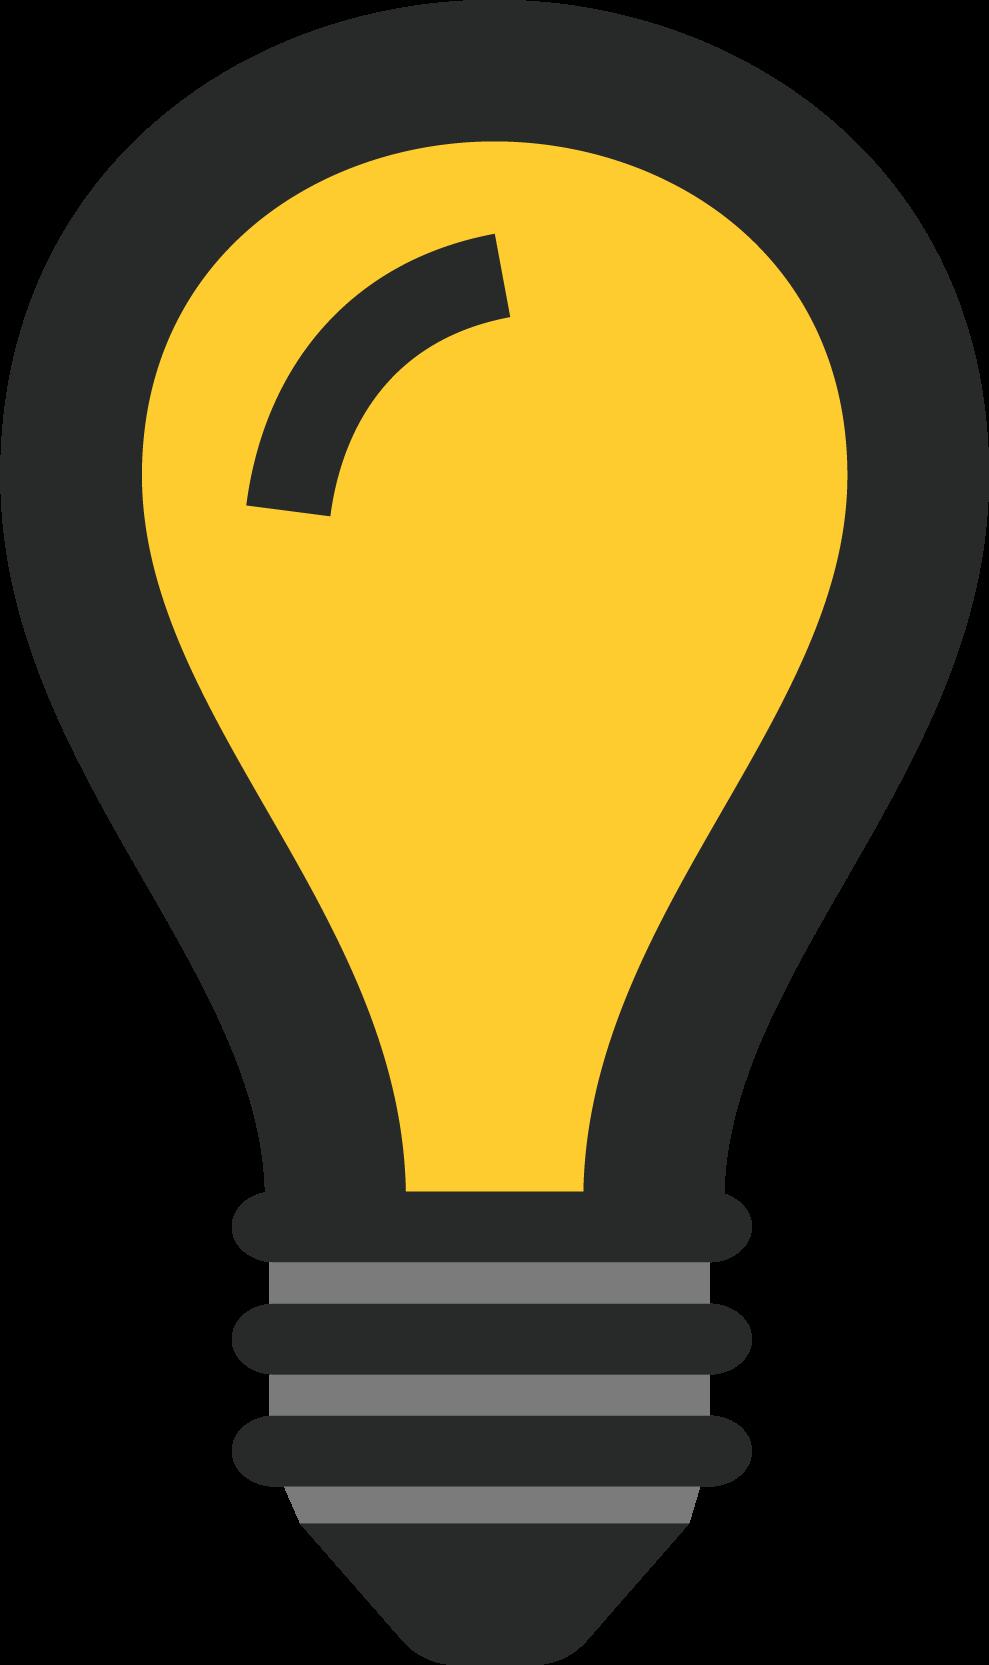 Graphic of a lightbulb